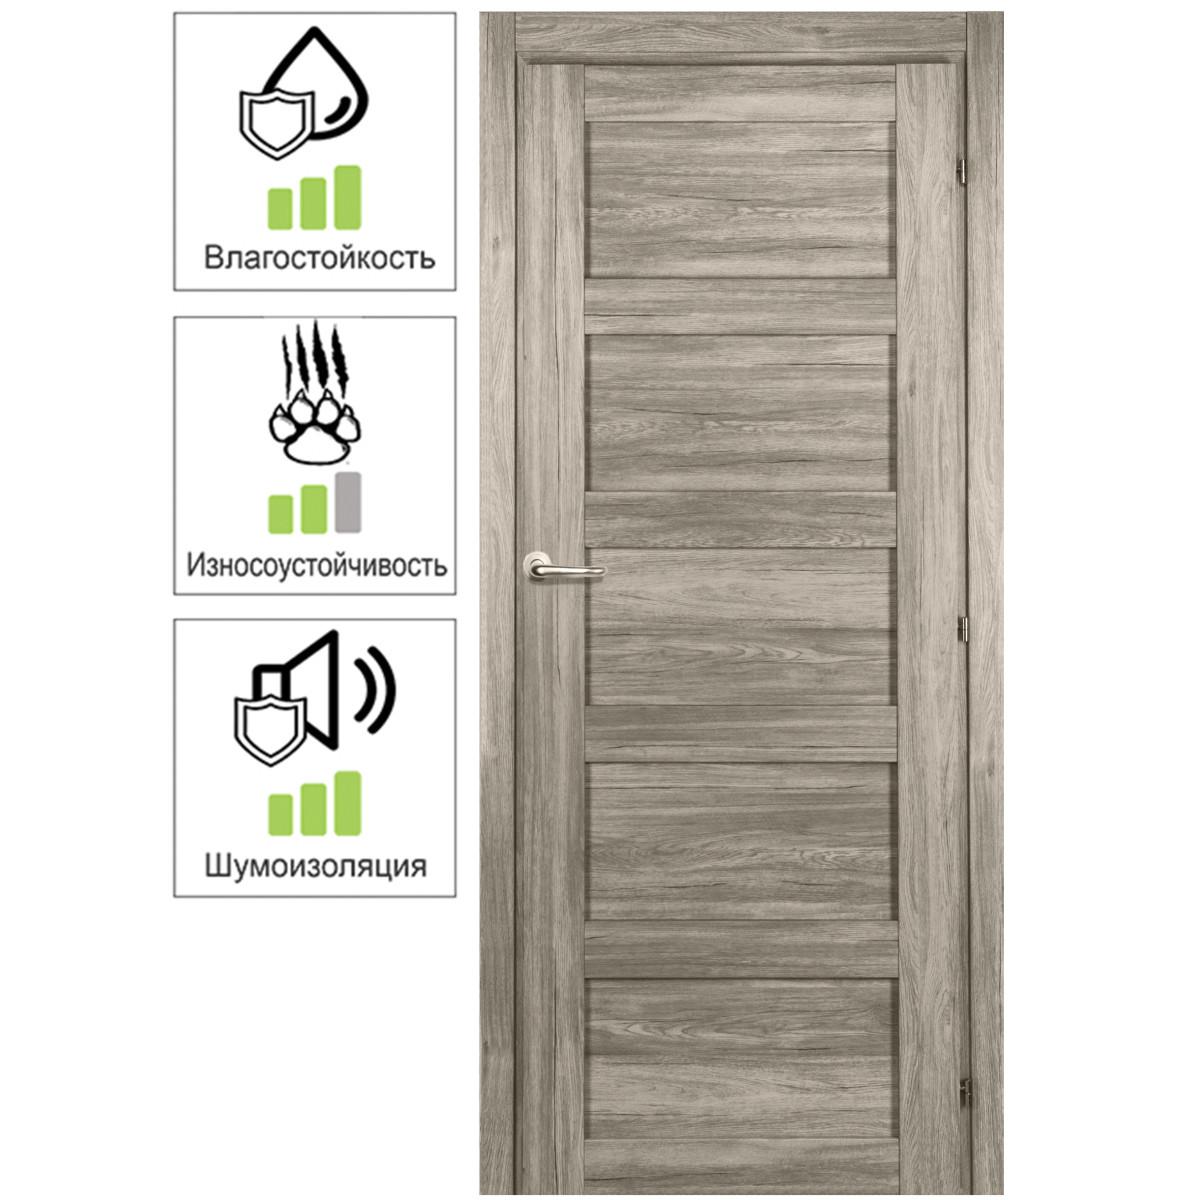 Дверь межкомнатная Прэсто 60х200 см ПВХ цвет дуб санремо светлый с фурнитурой